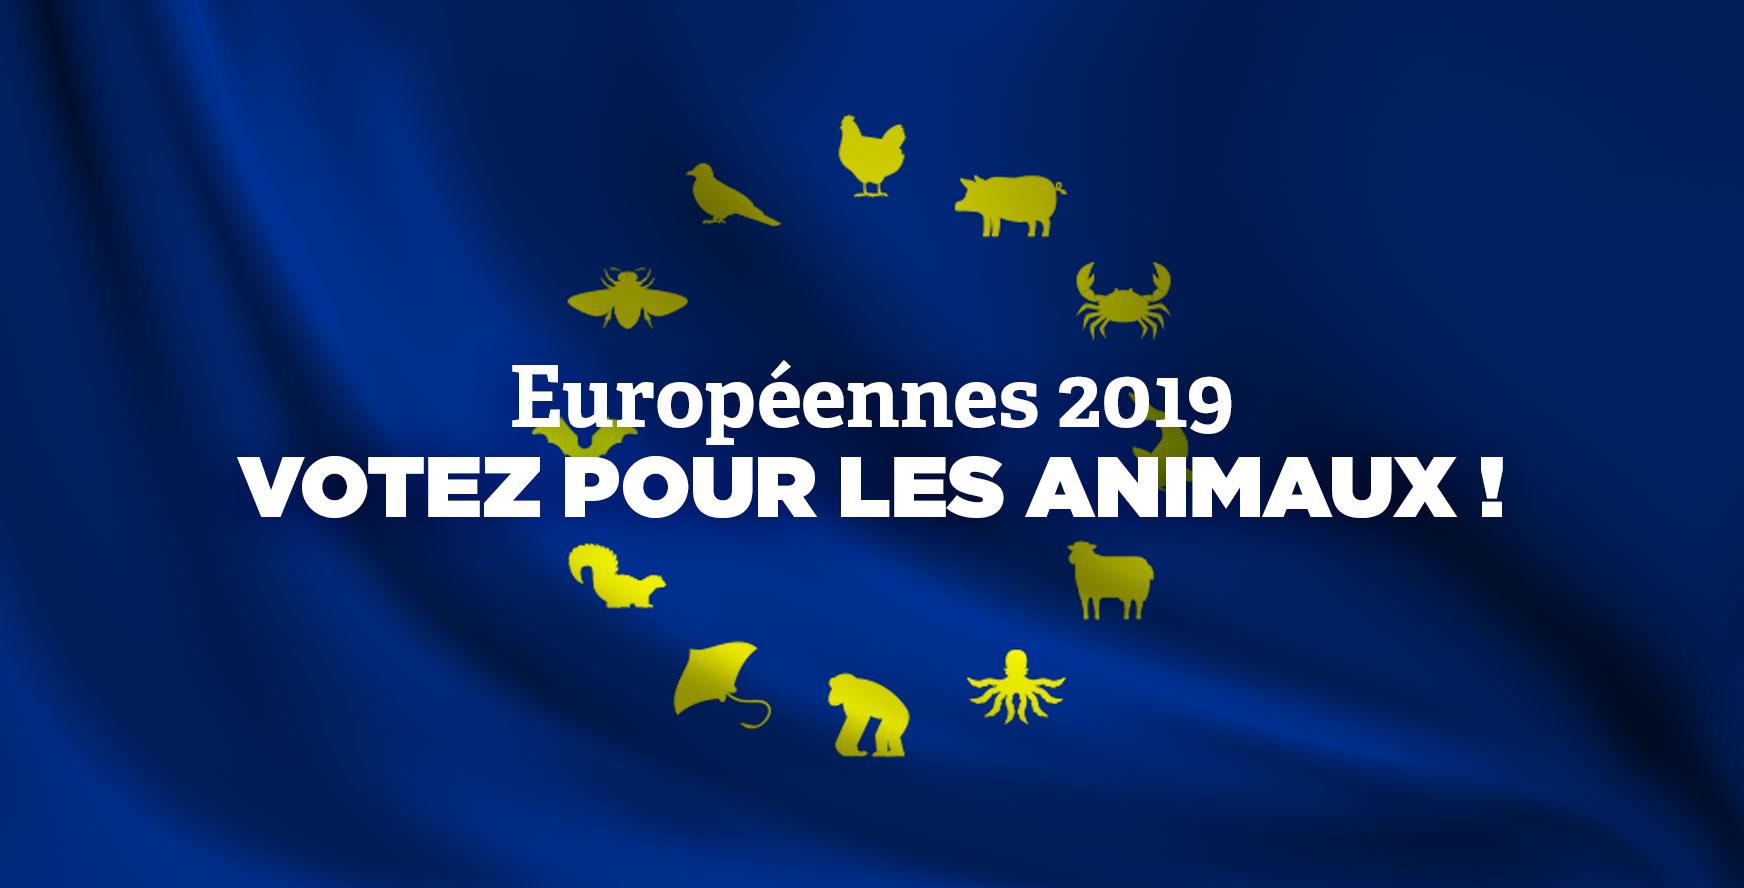 Dossier européennes 2019